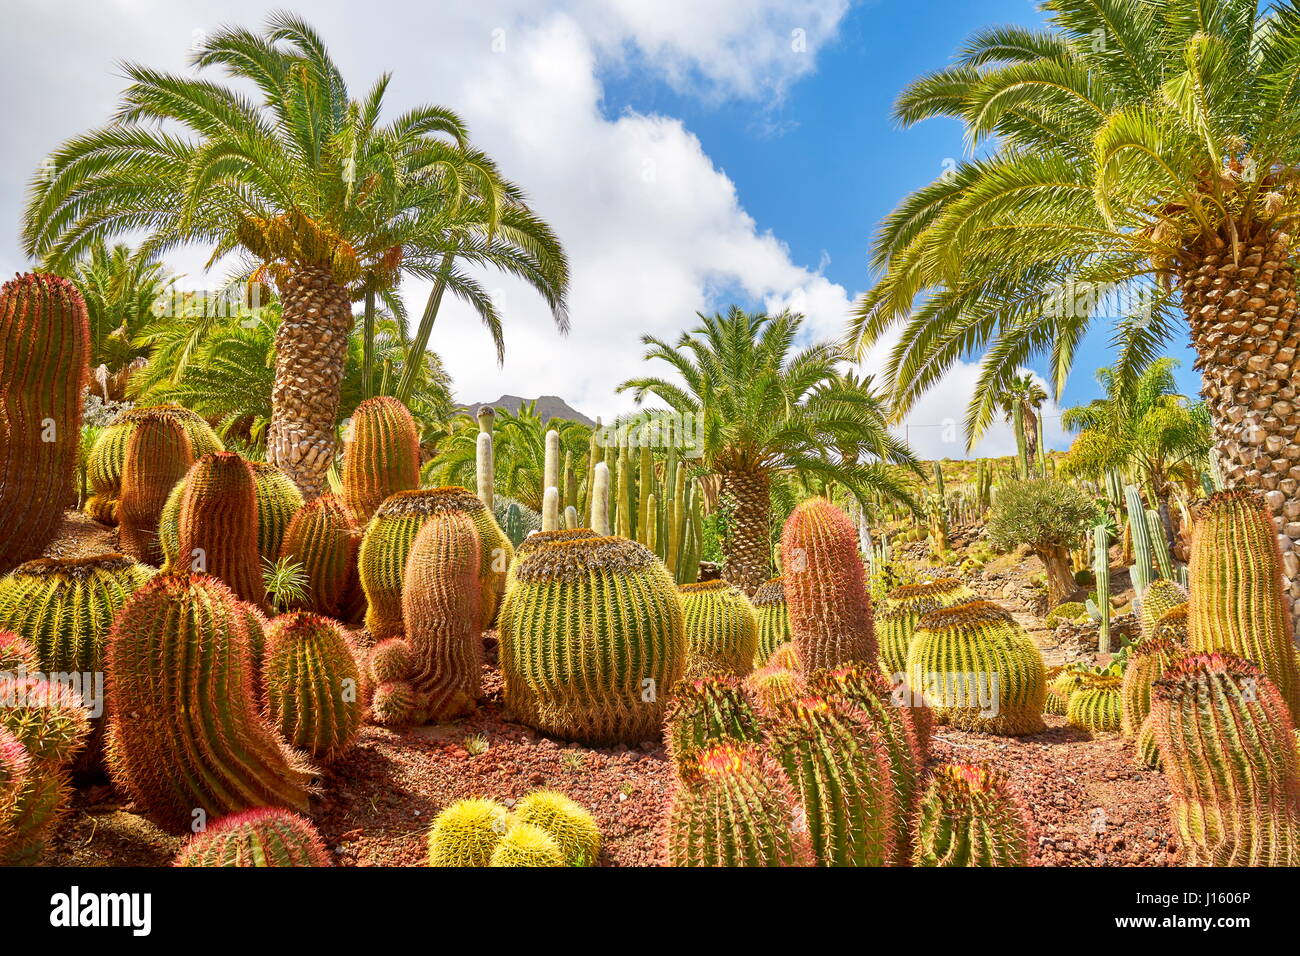 Jardín de Cactus, Gran Canaria, España Foto de stock